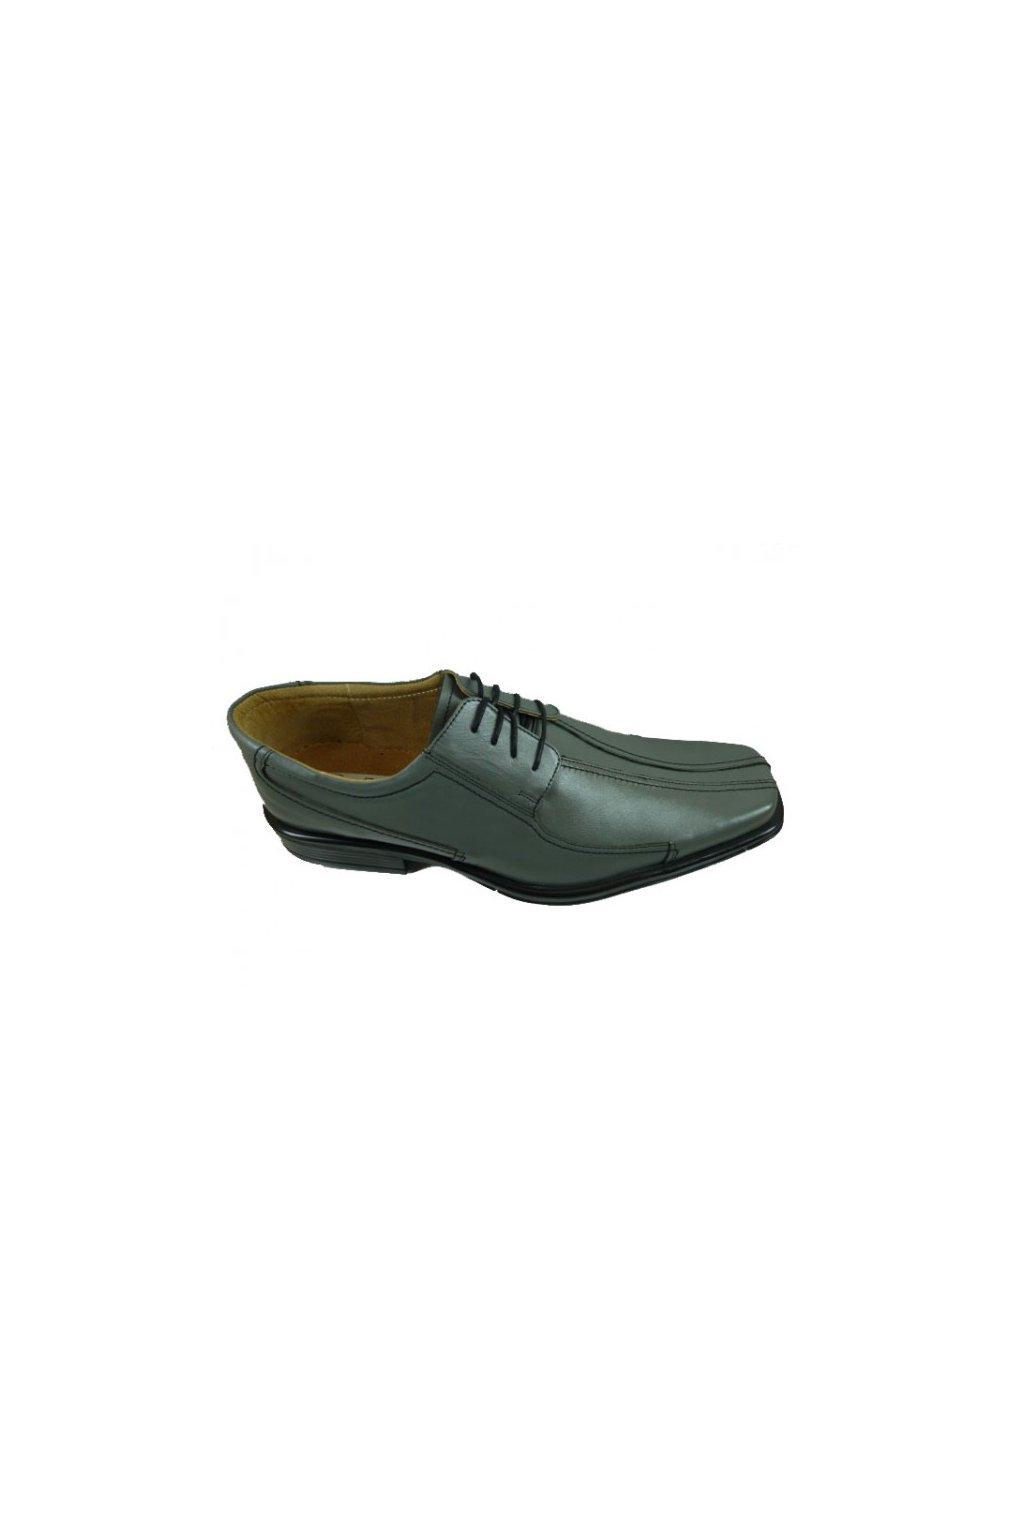 Nadměrná pánská obuv Kuda 524 šedá